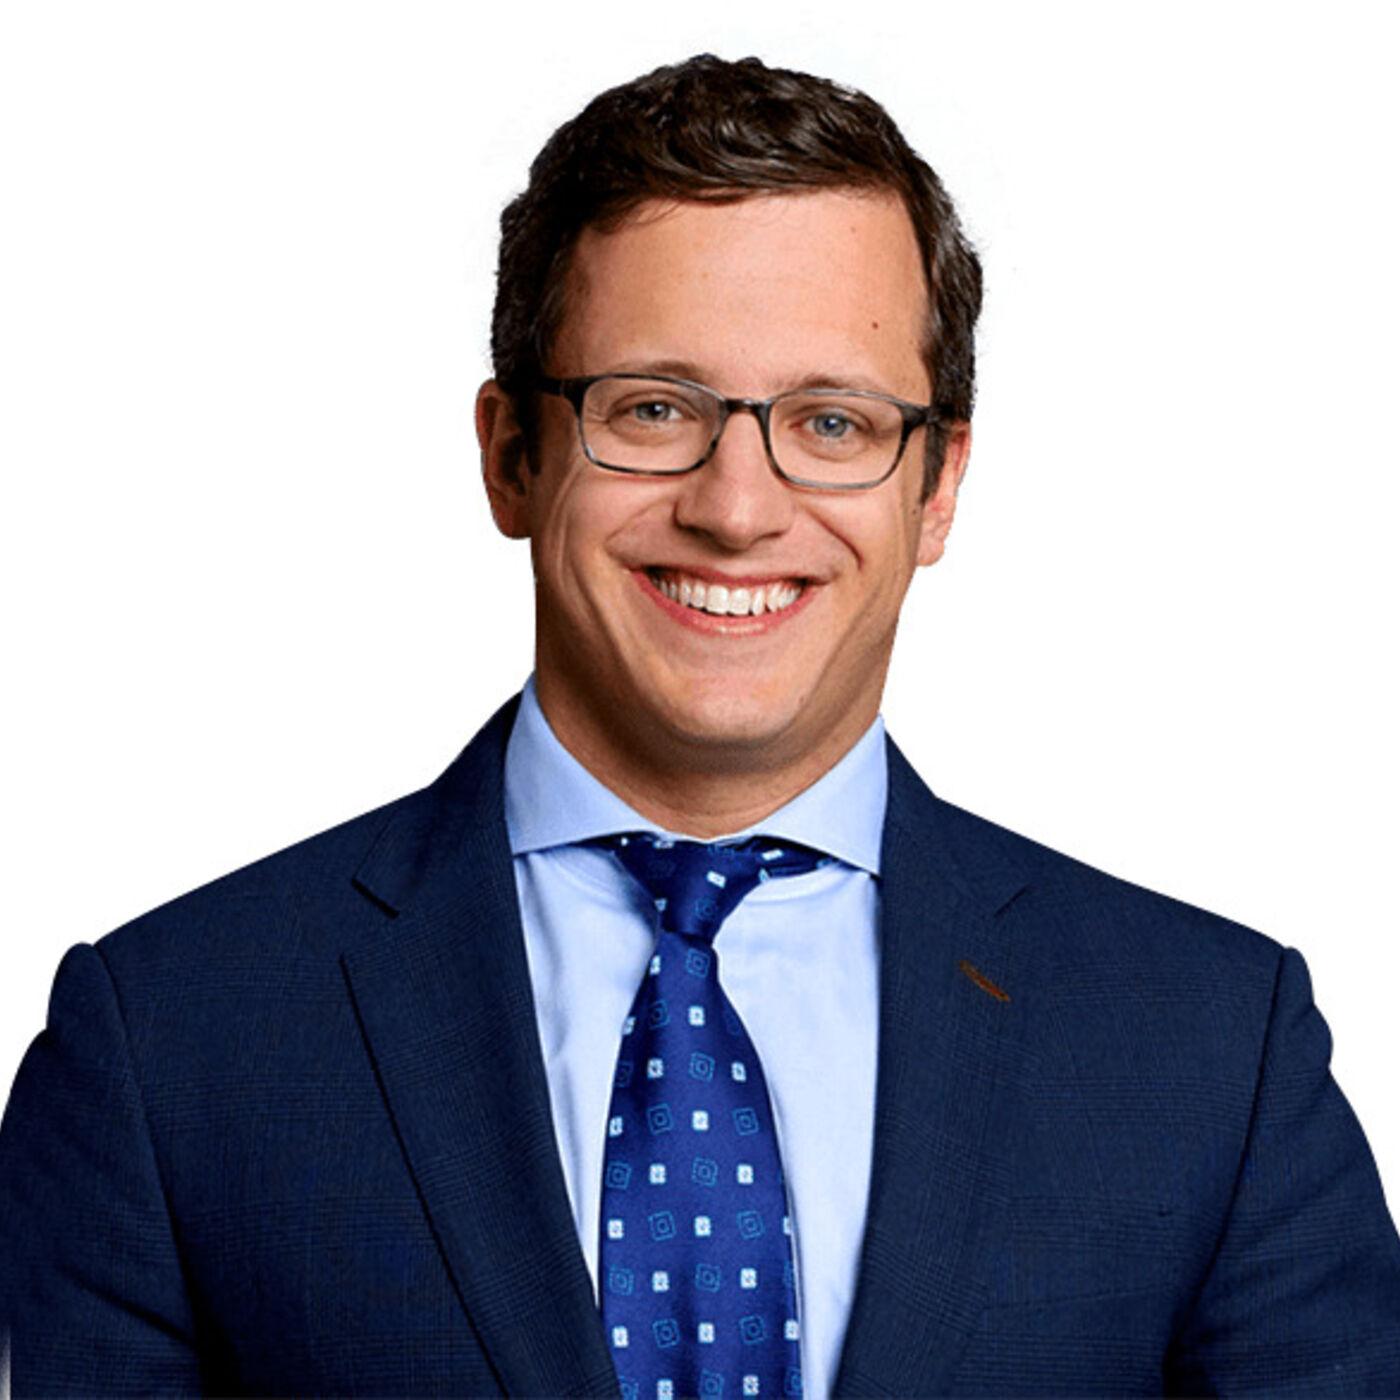 Medical Device Rep Podcast: Dr. Jonathan Vigdorchik